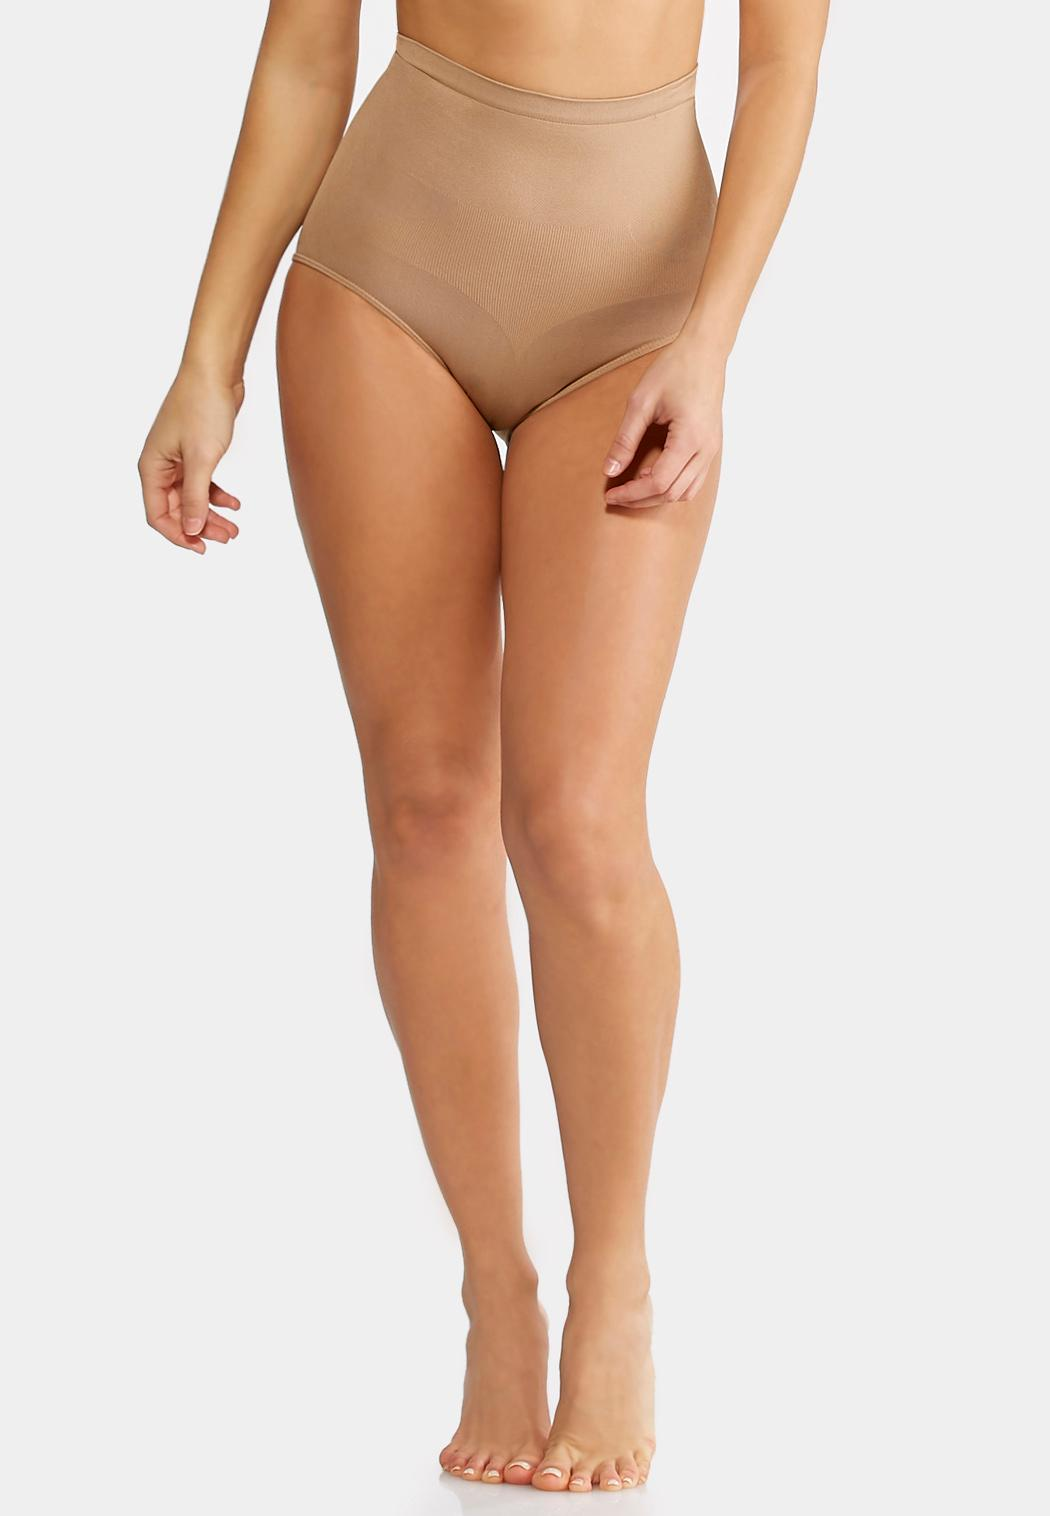 Nude Seamless Control Panties